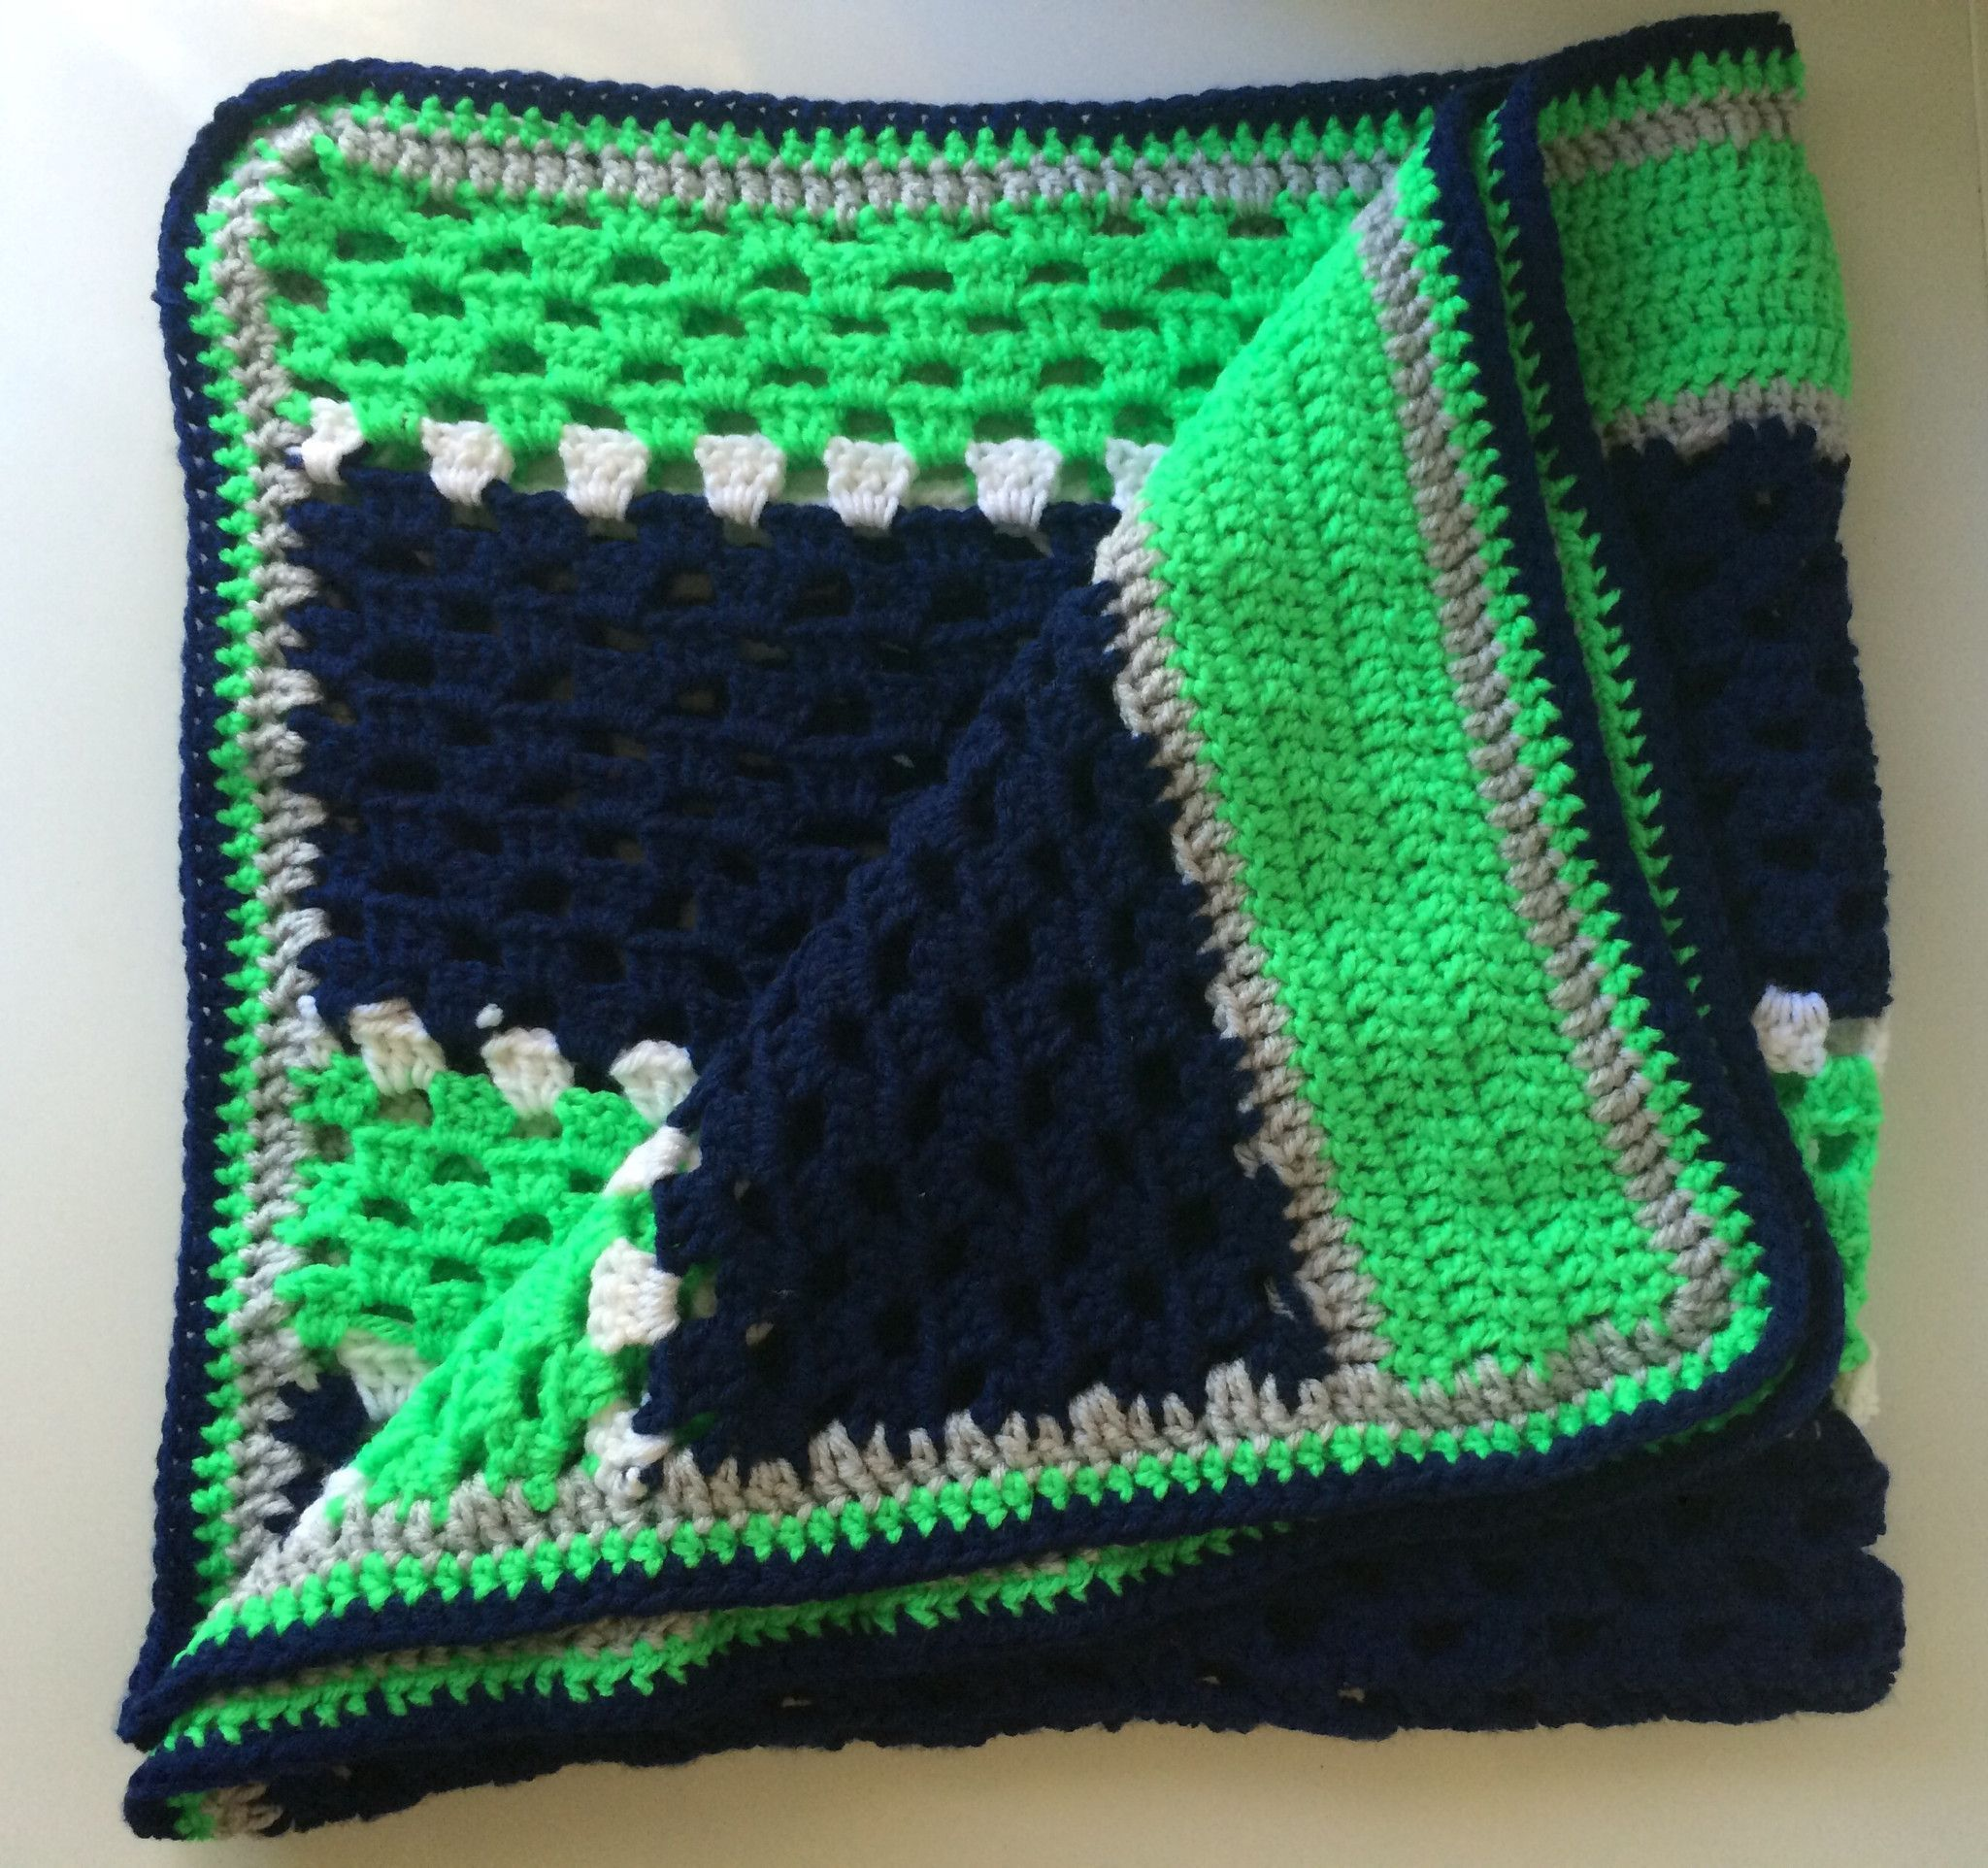 Seattle Seahawks Inspired Football Crochet Baby Blanket | A ...